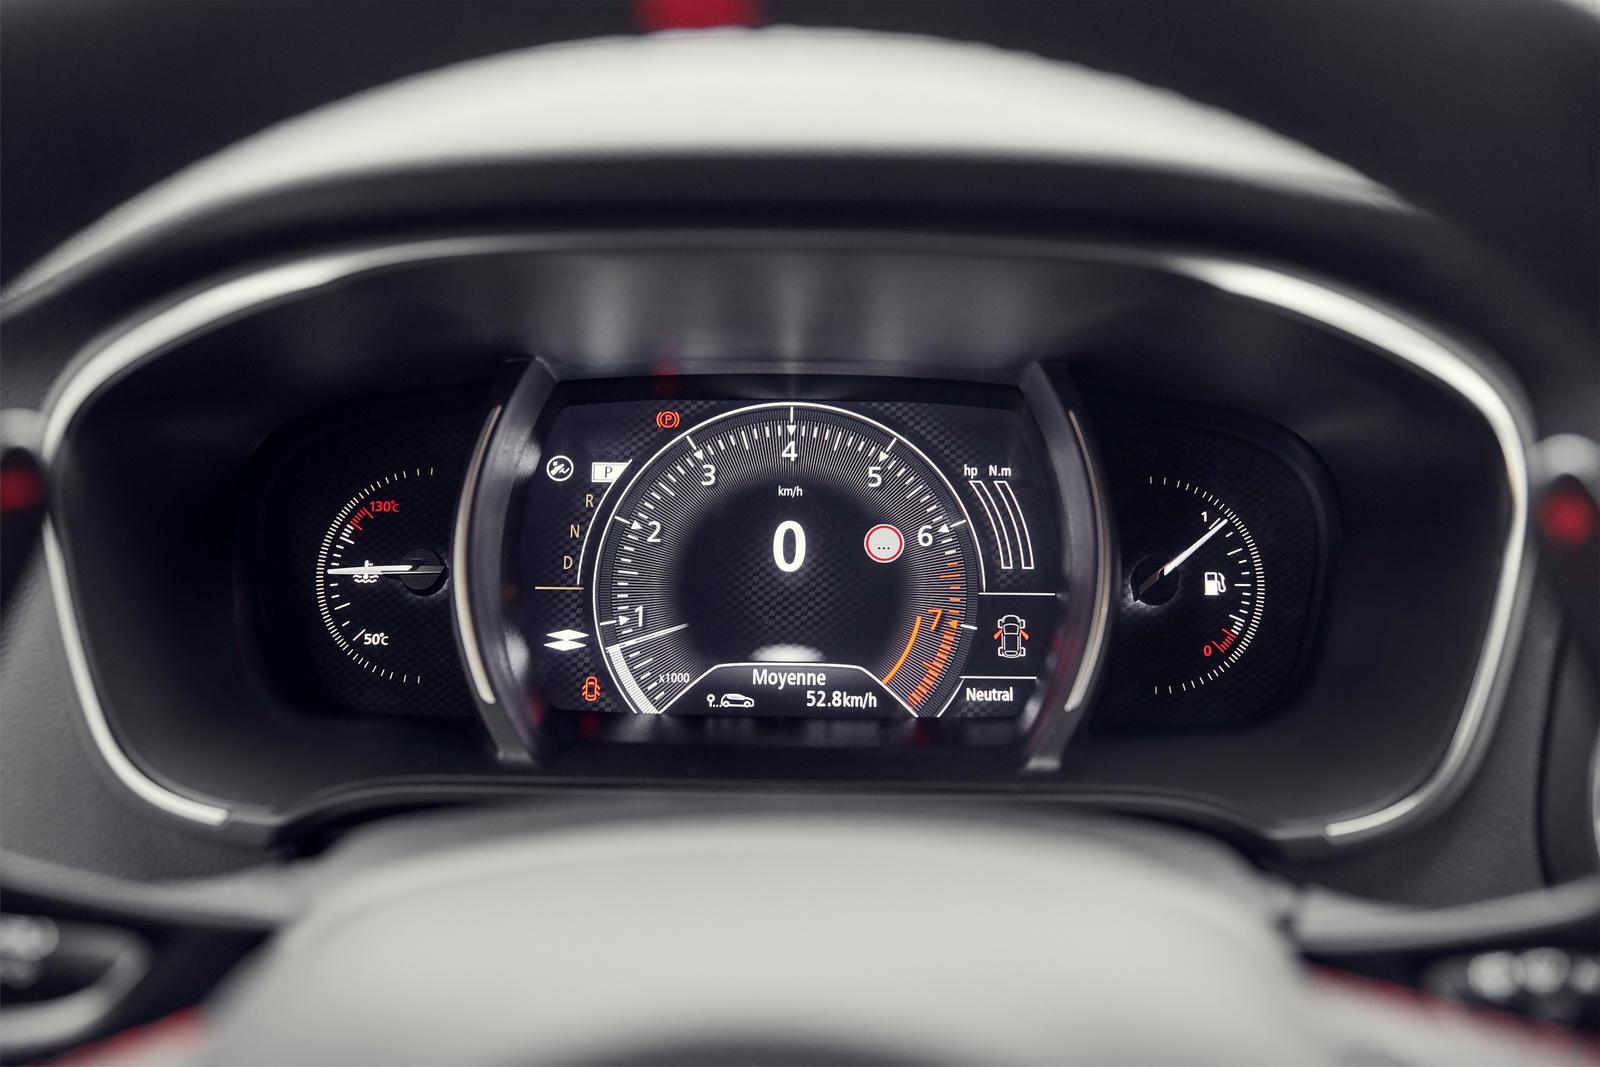 Pogledajte kako ubrzava Renault Megane RS (video)